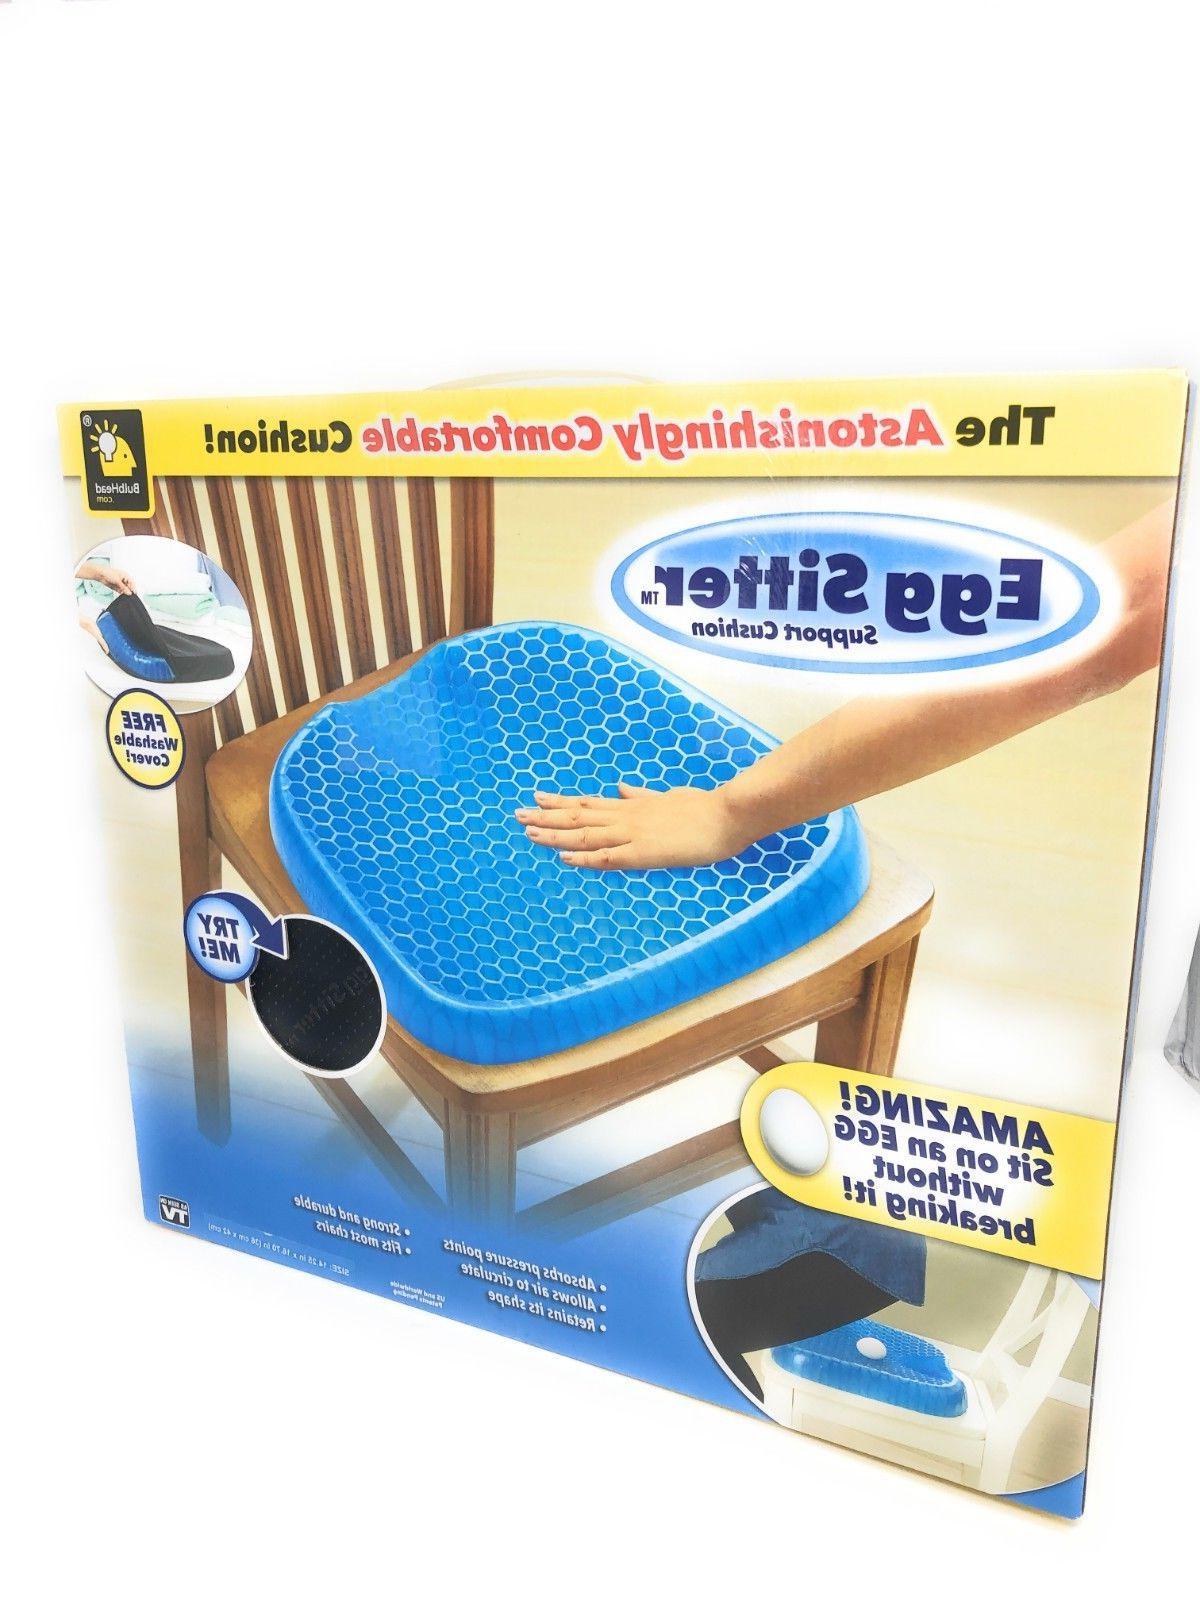 BulbHead Cushion with Breathable Honeycomb